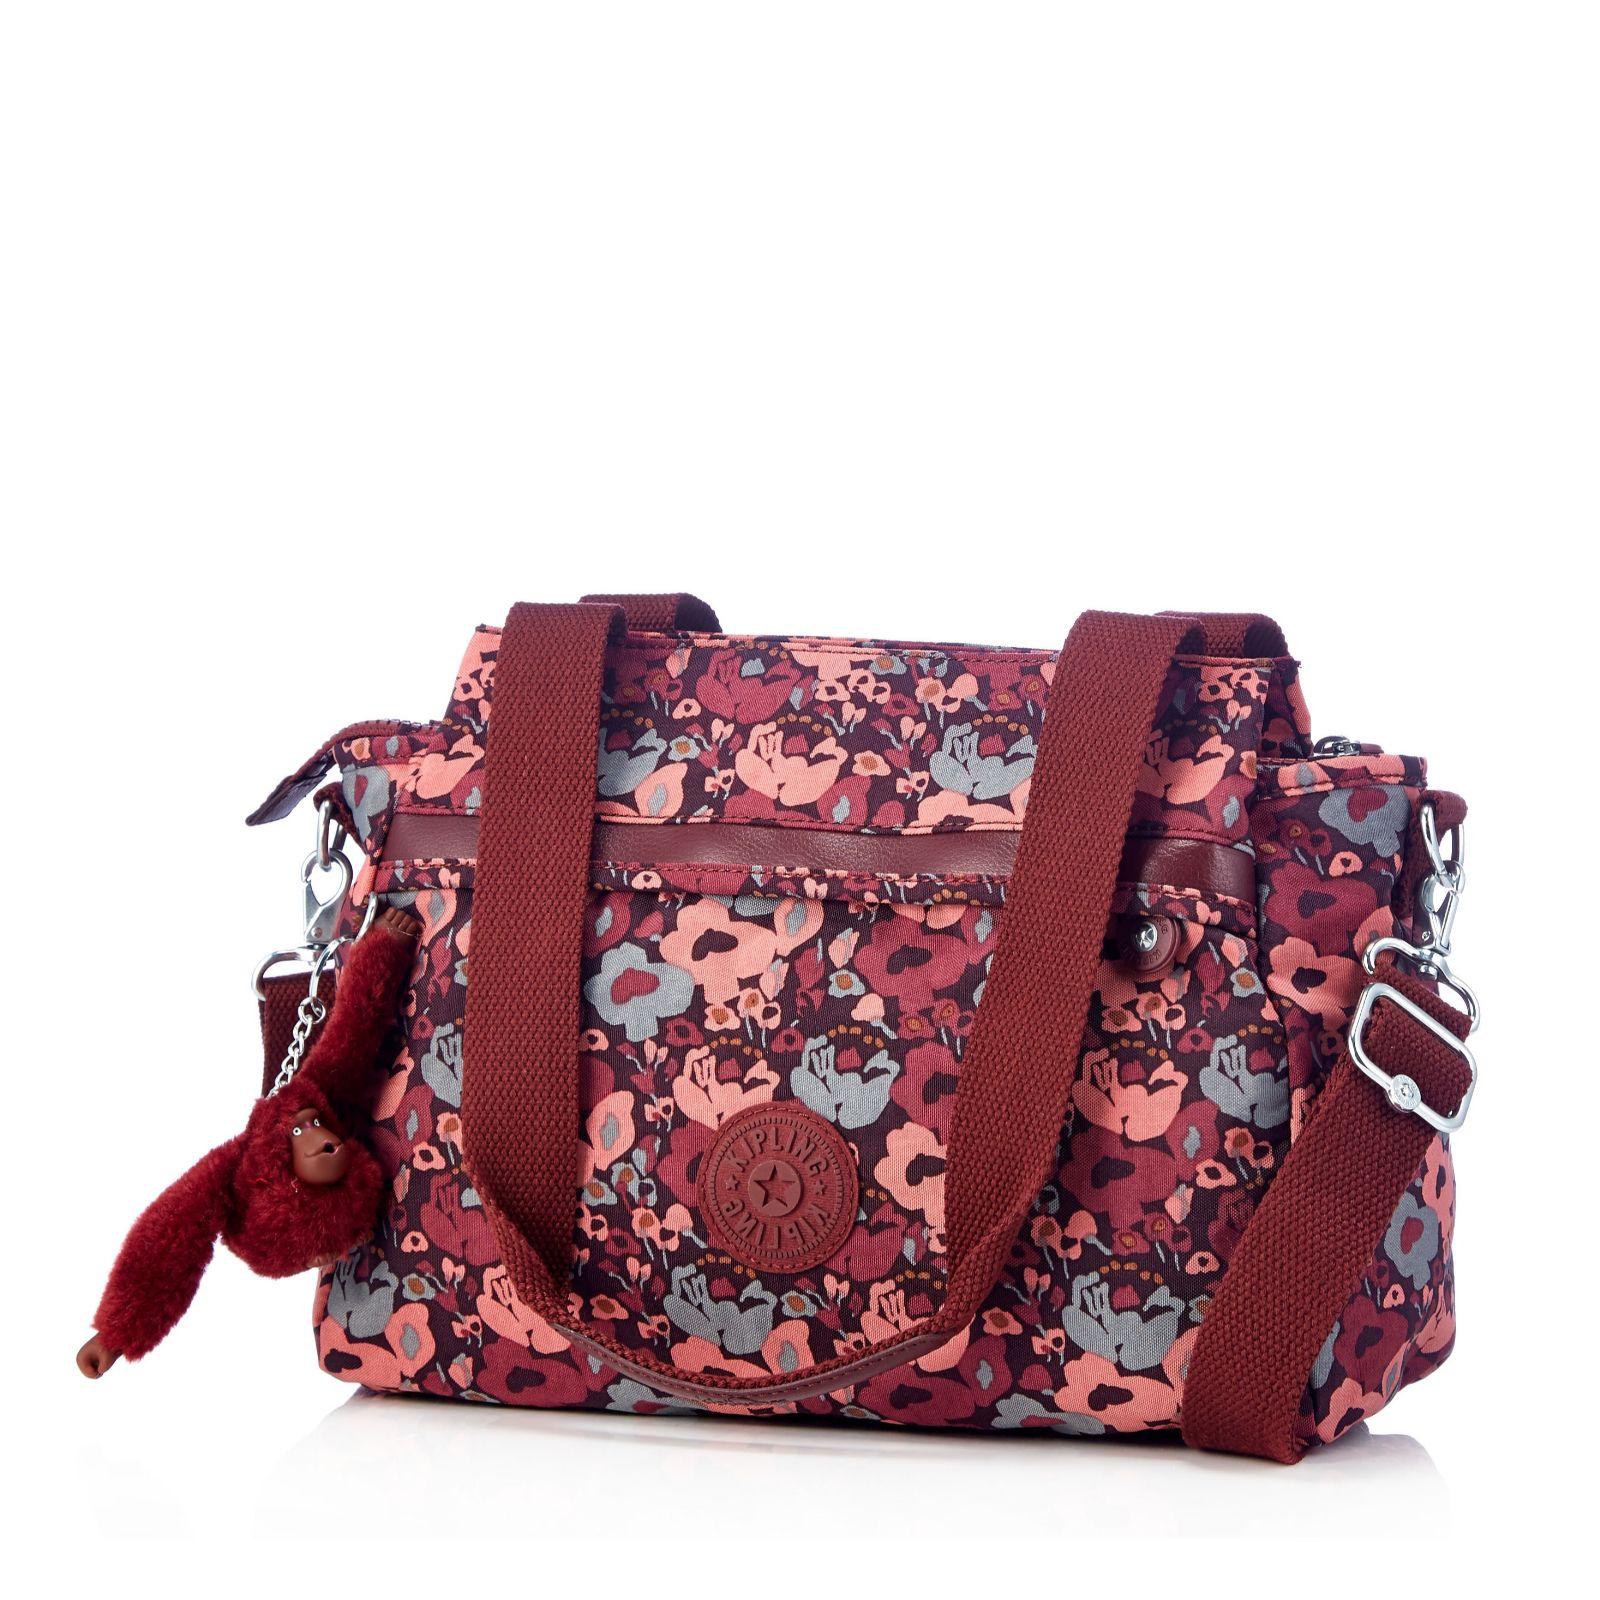 c794e24225a0 Kipling Neila Medium Shoulder Bag - QVC UK